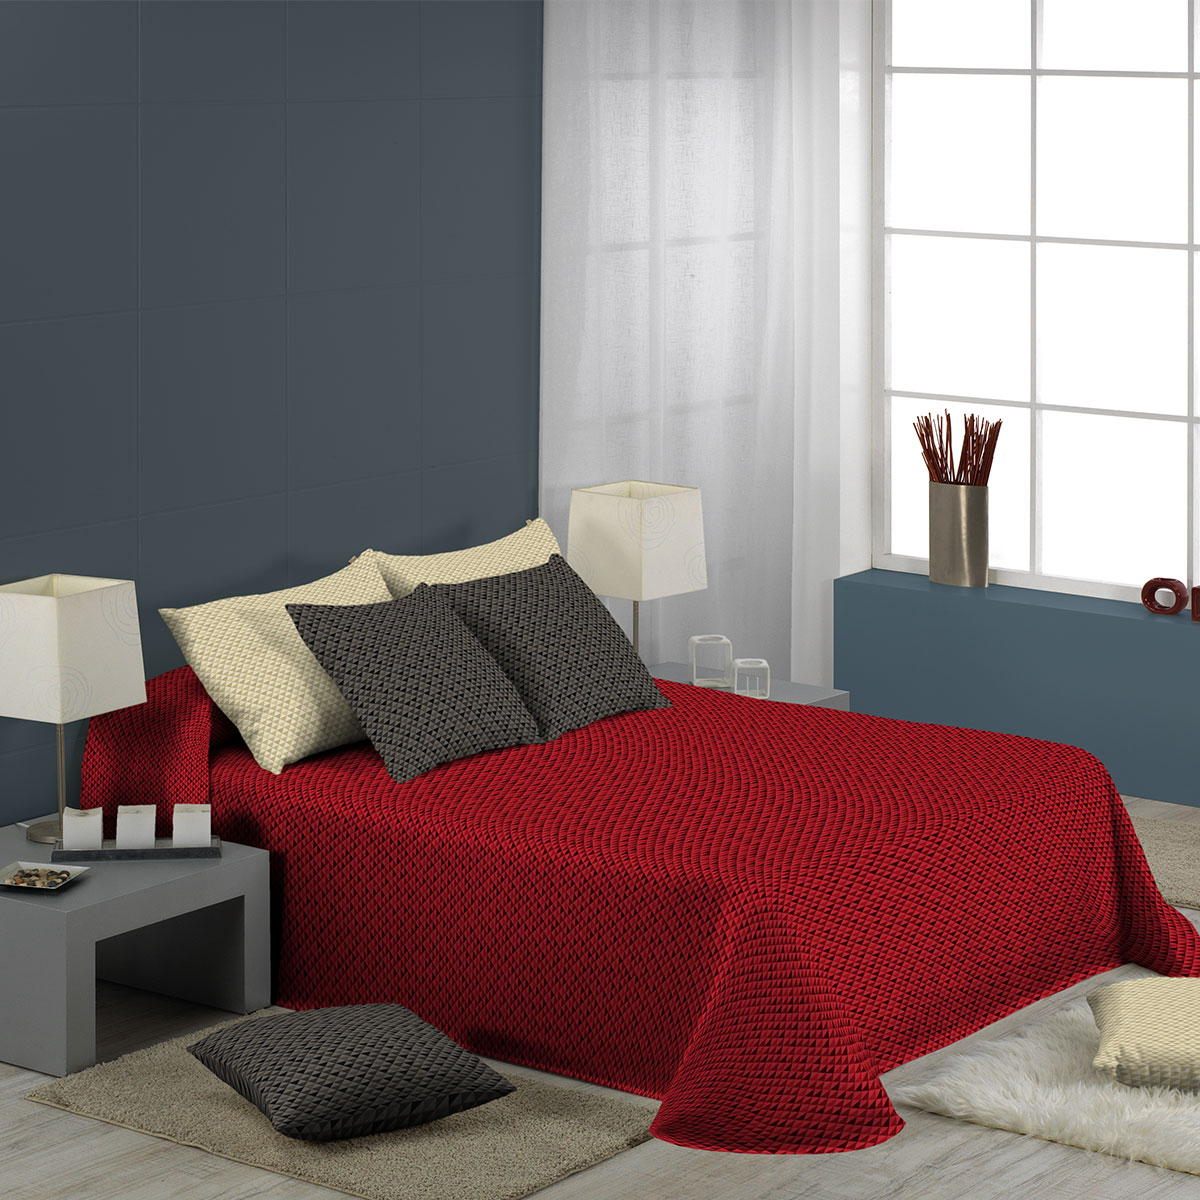 jet de lit nil effet boutis standard textile. Black Bedroom Furniture Sets. Home Design Ideas